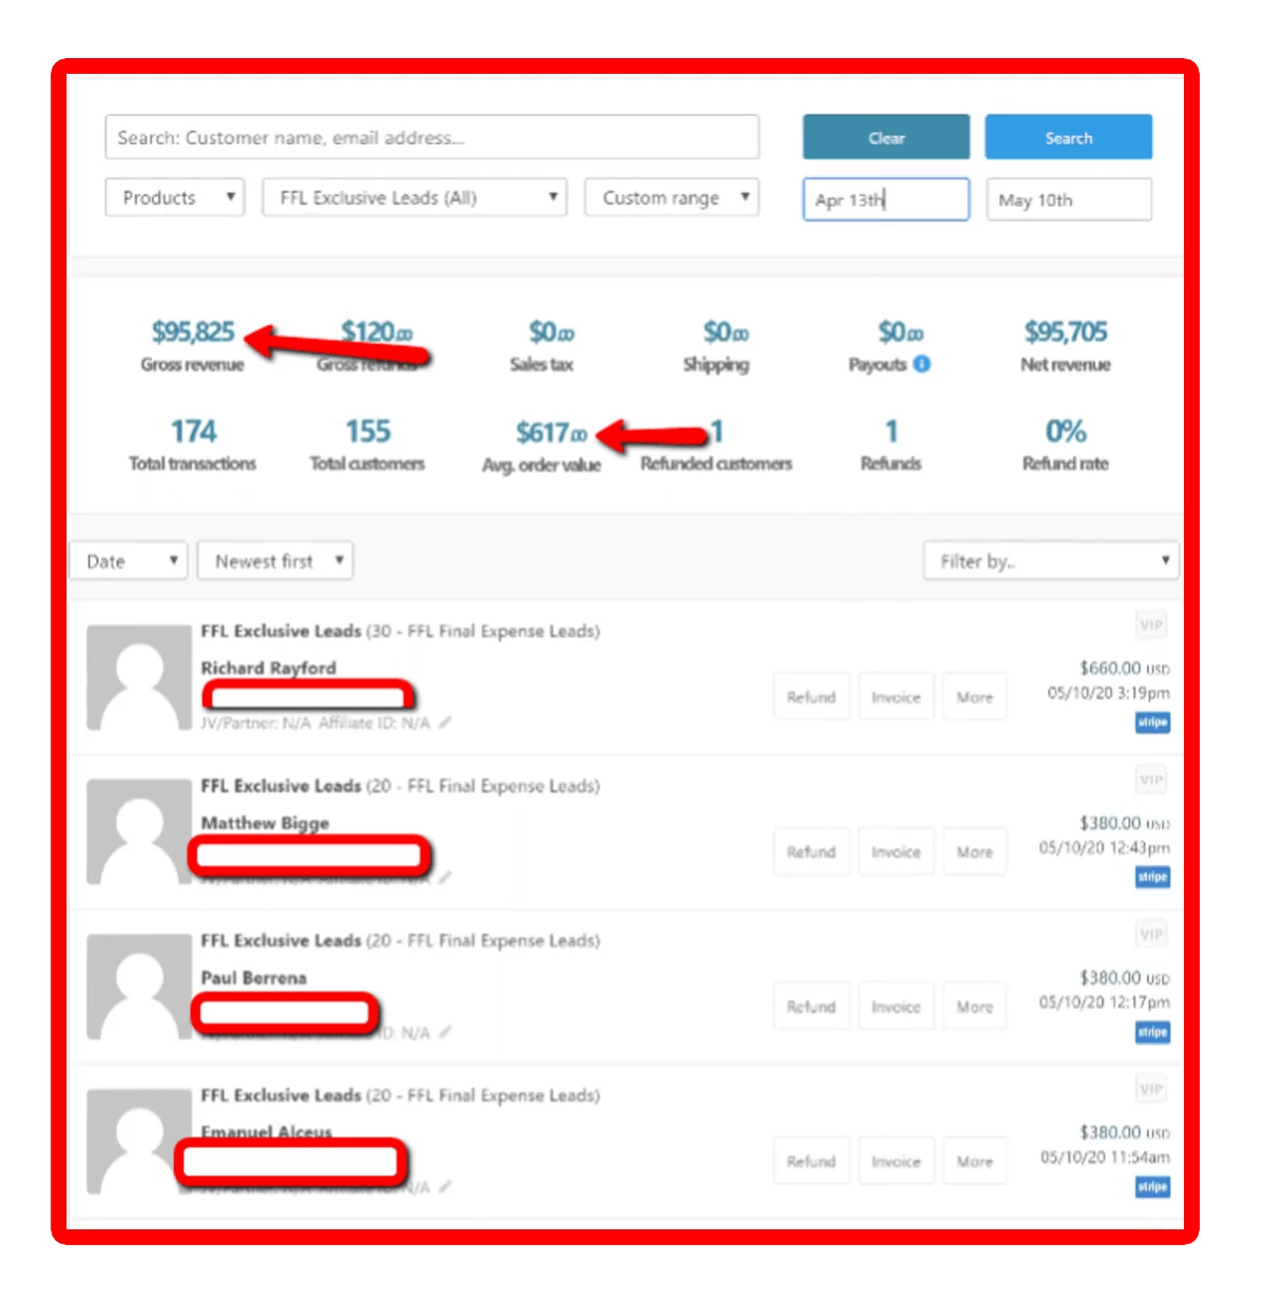 LinkedIn results